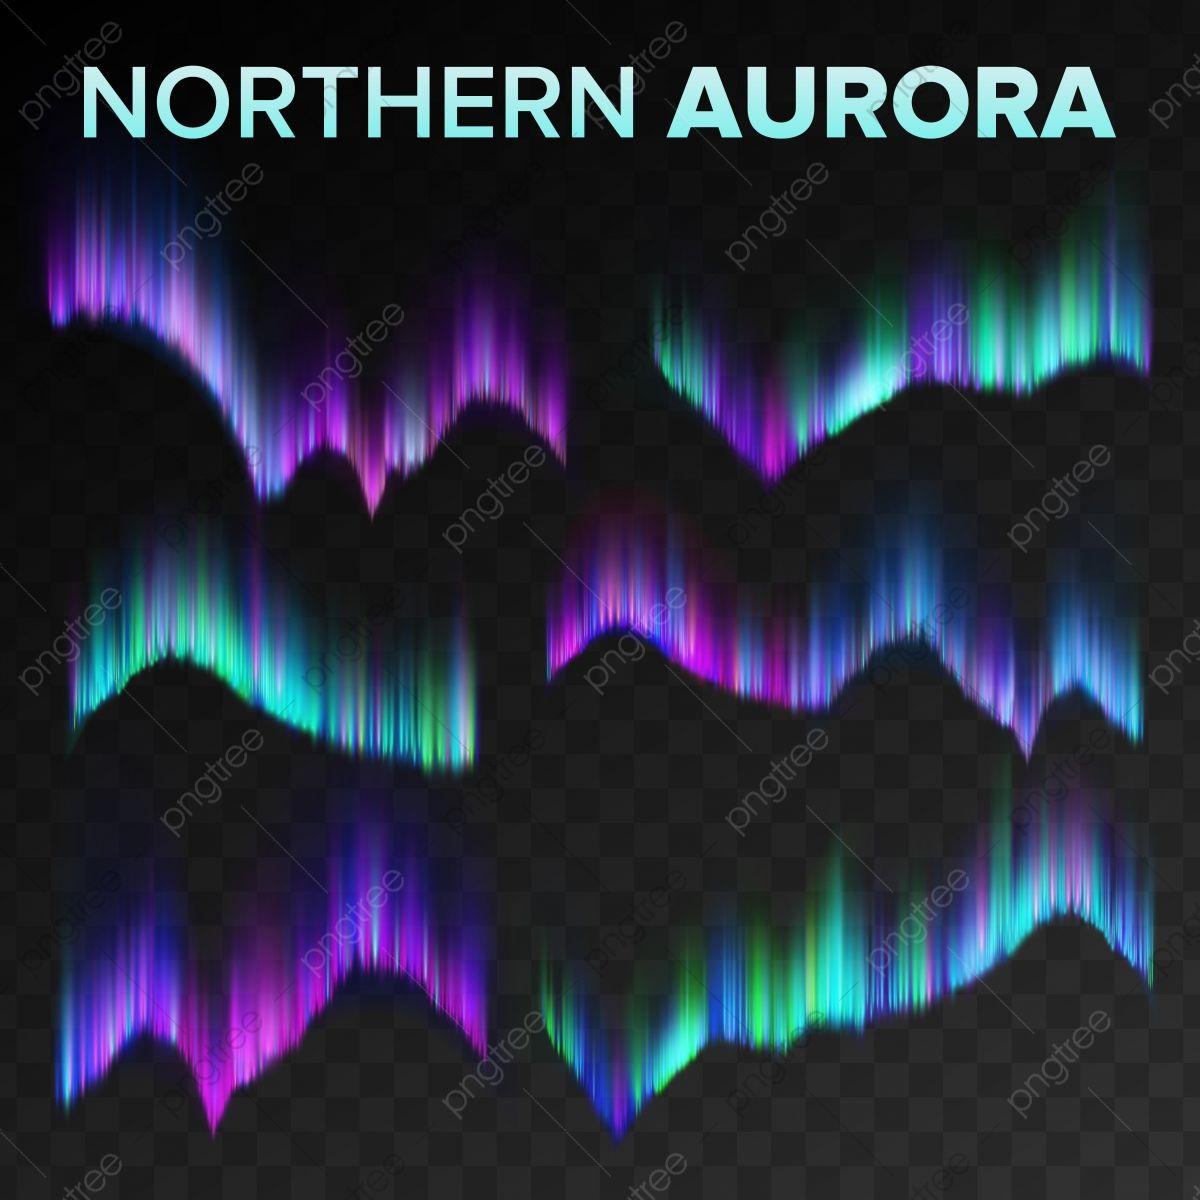 Northern Aurora Set Vector Polar Sky Night Shiny Magical Phenomenon Black Transparent Background Abstract Aurora Borealis North Mystery Atmosphere S Realistic I Aurora Aurora Borealis Simple Background Images